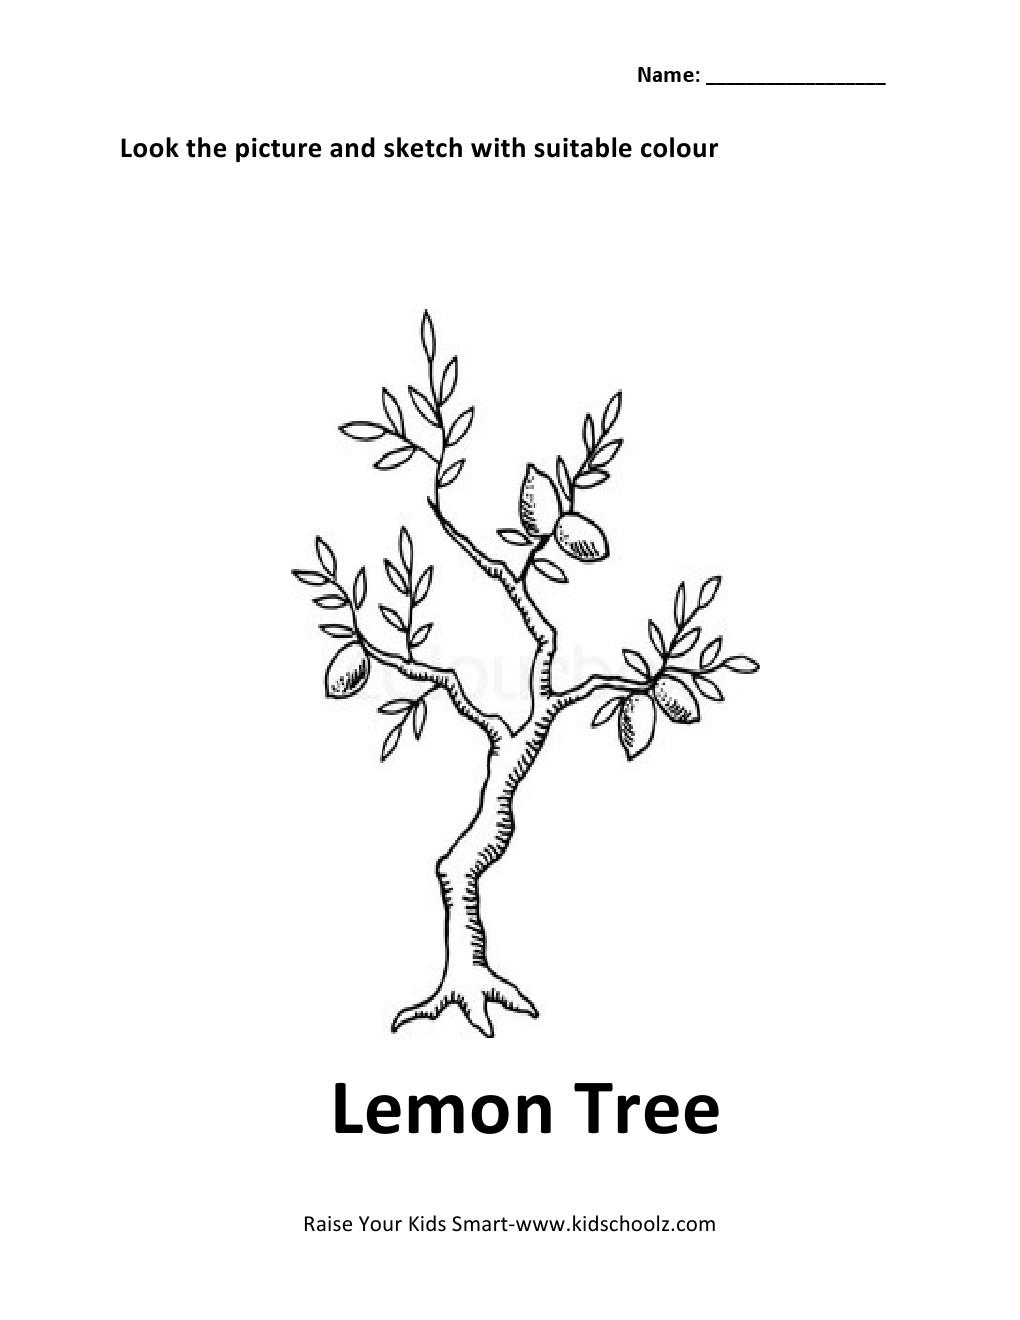 colouring worksheet lemon tree kidschoolz